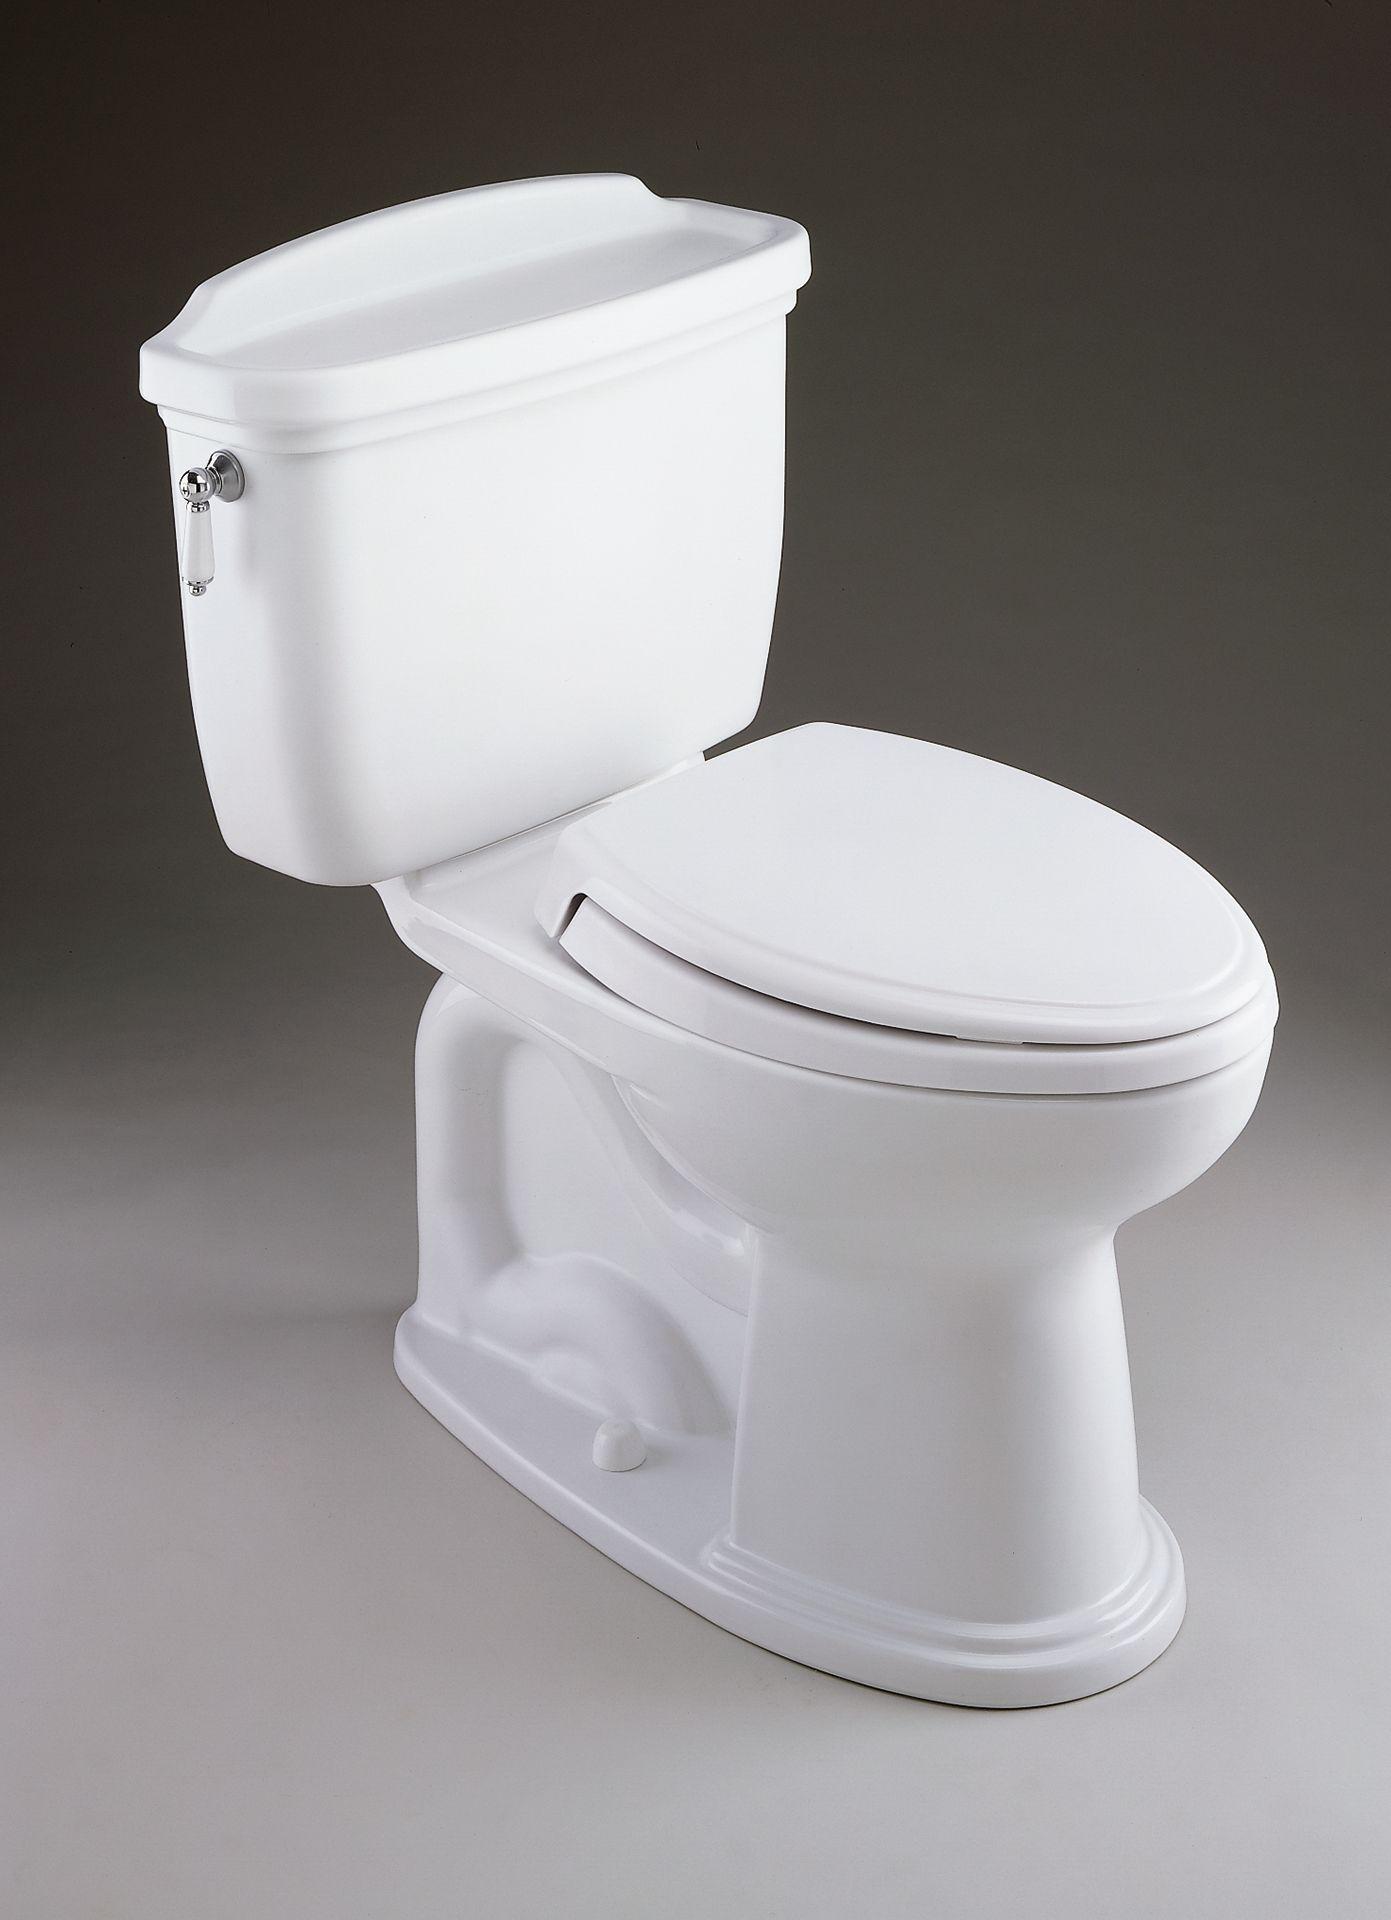 Eco Dartmouth® Two-Piece Toilet, 1.28 GPF, Elongated Bowl - TotoUSA.com